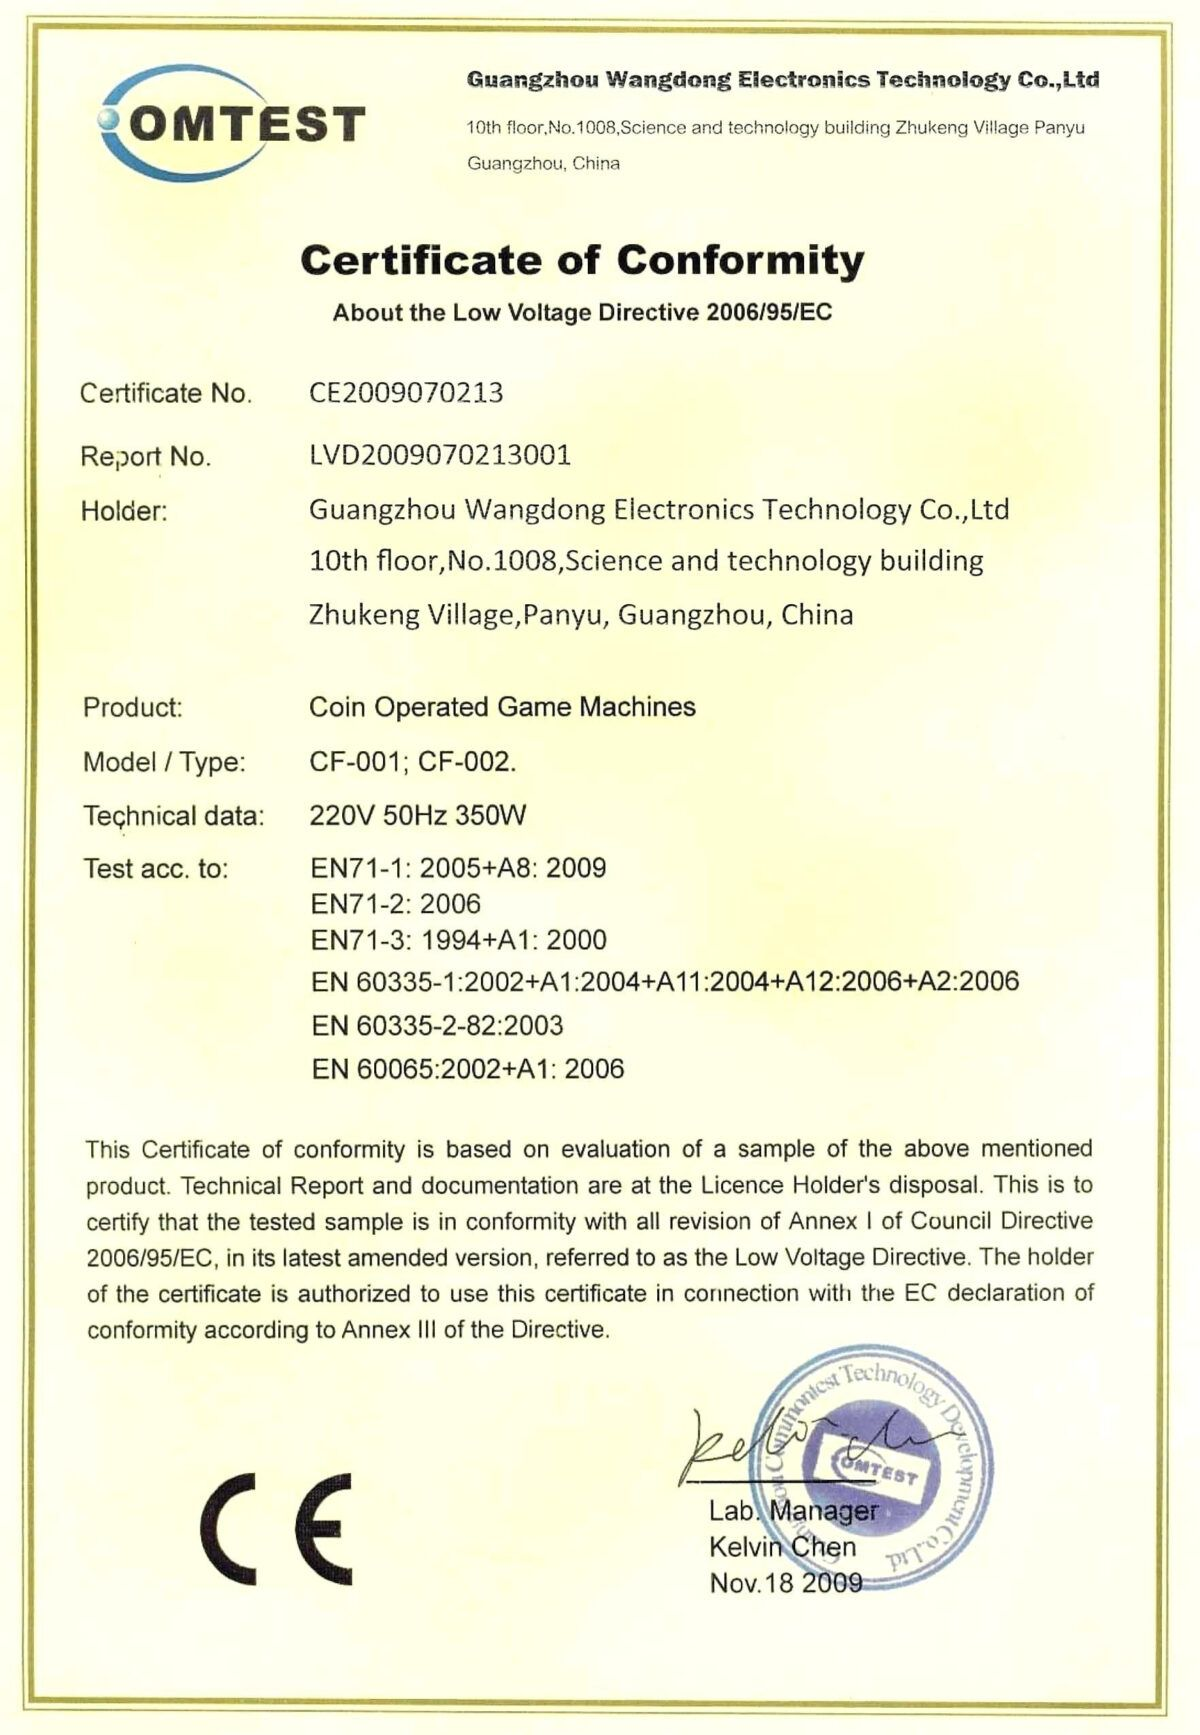 Blank Printable Certificate Of Conformity Coc Form Pertaining To Certificate Of Confor Printable Certificates Certificate Templates Business Plan Template Certificate of conformance template pdf